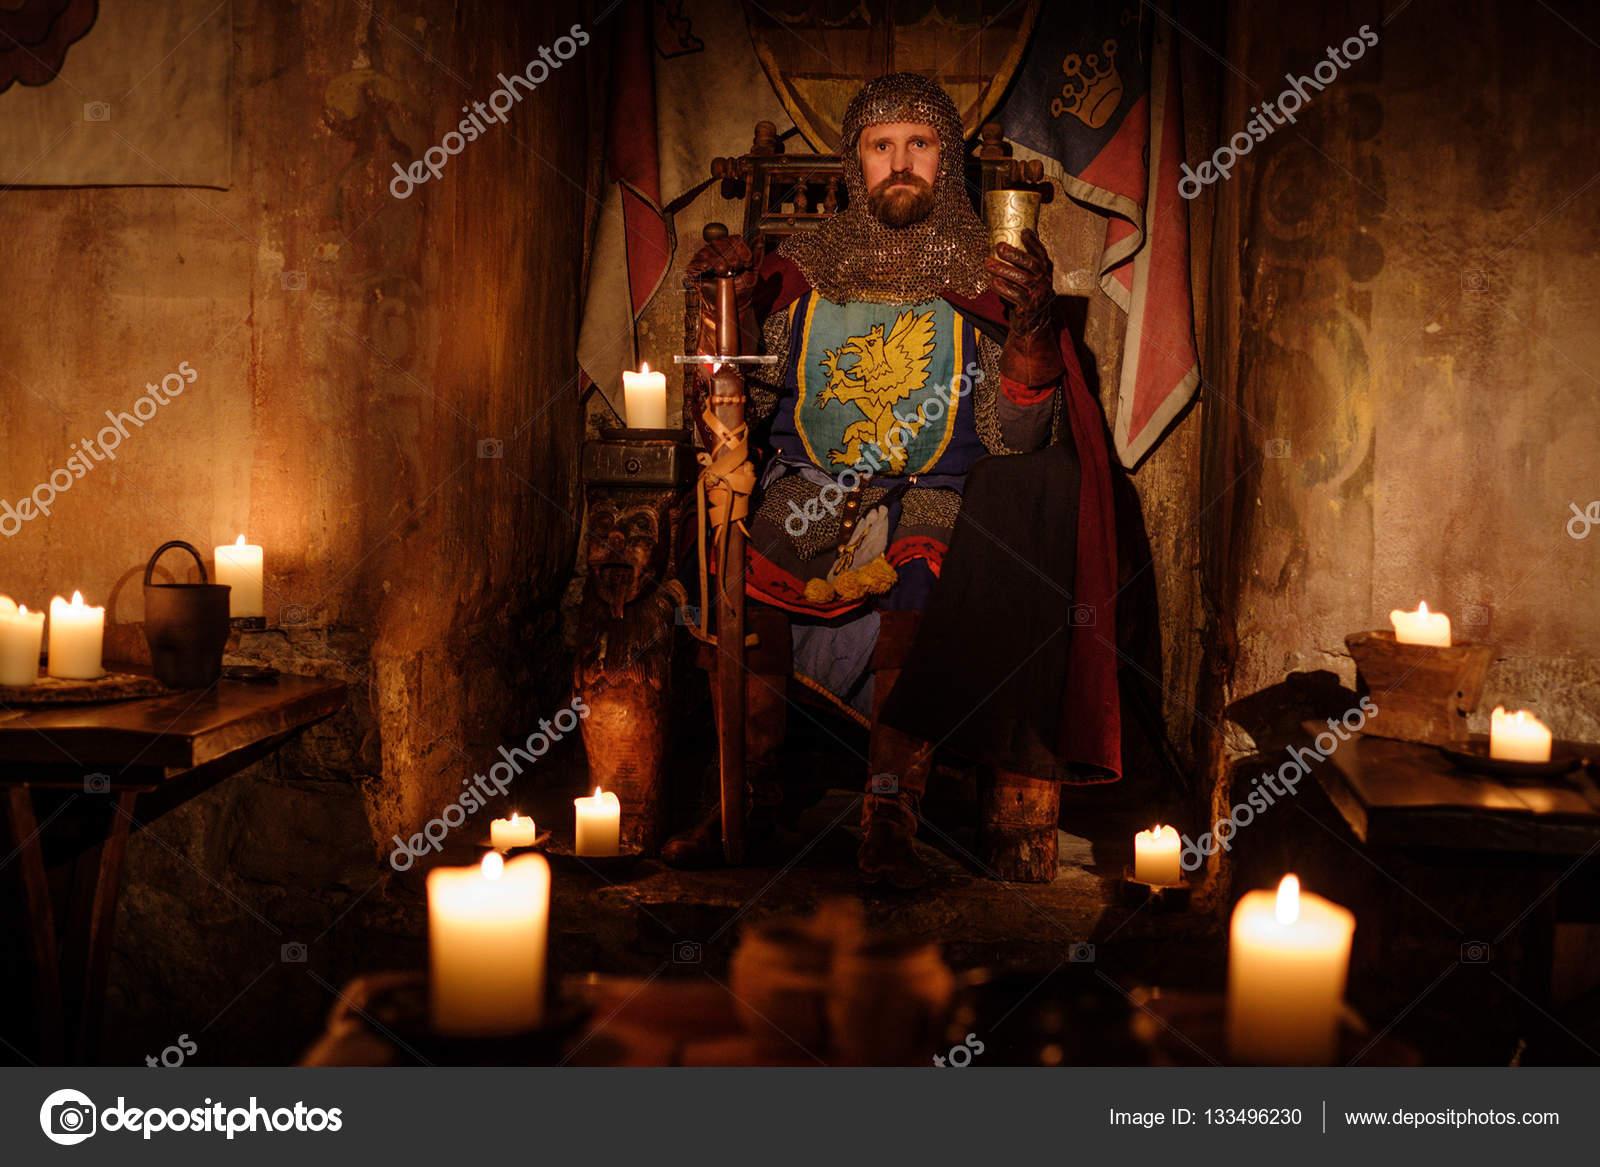 Middeleeuwse koning op de troon in oude kasteel interieur for De koning interieur